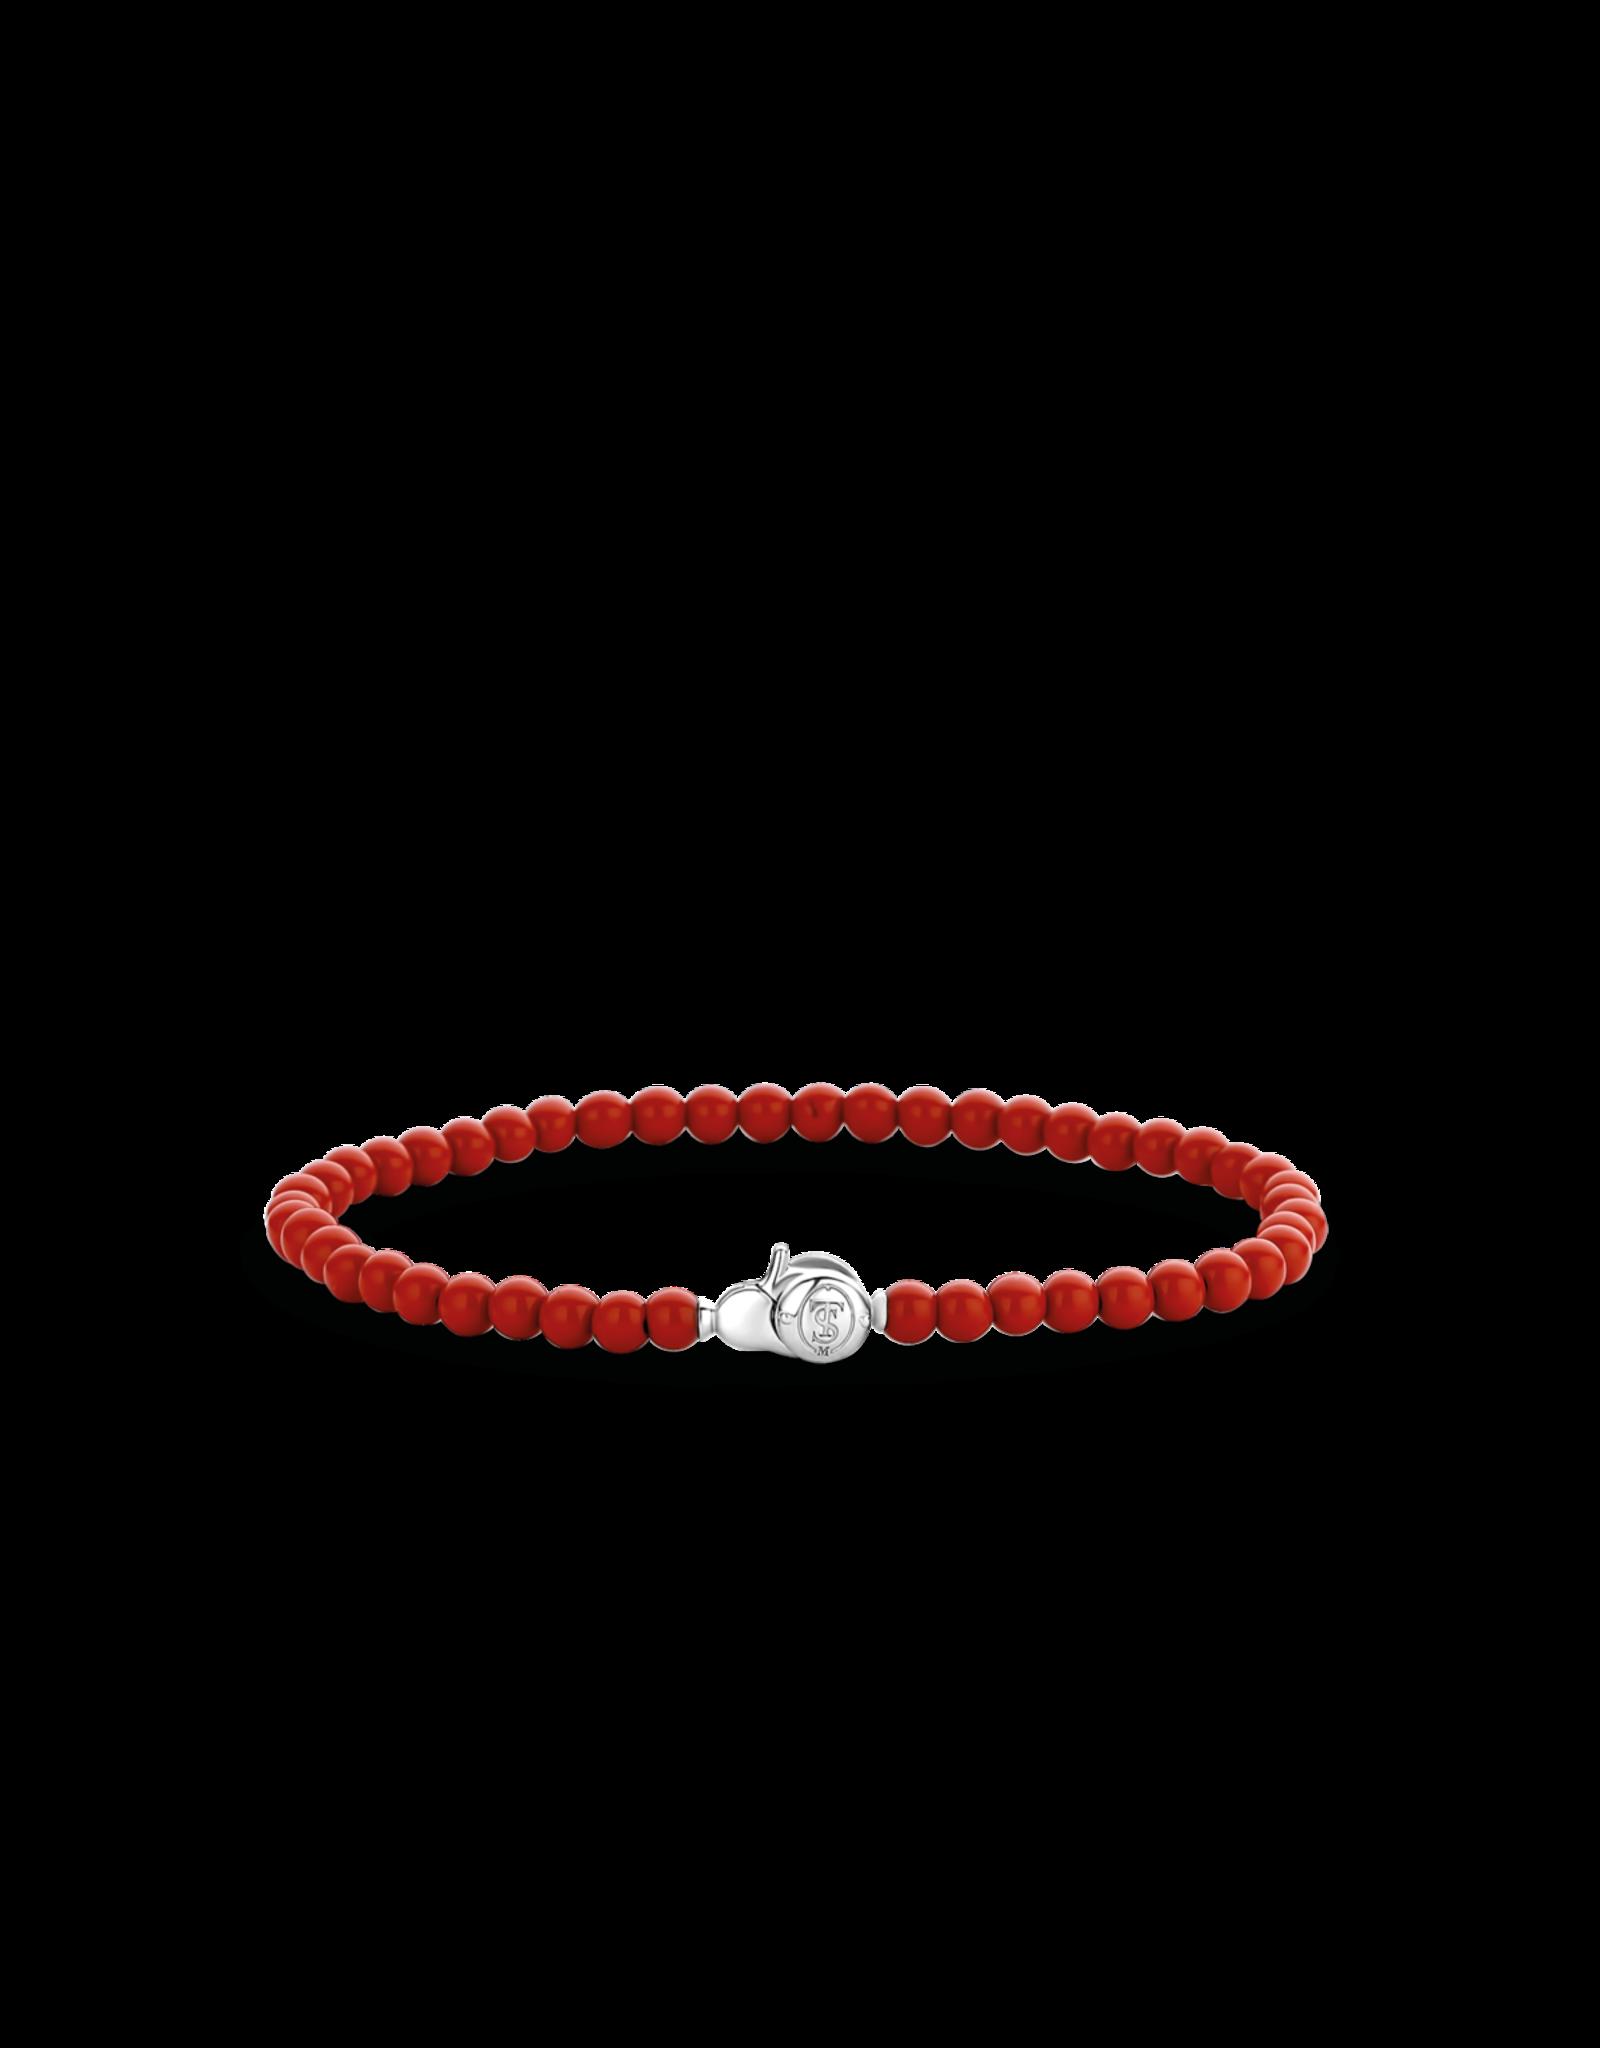 Dainty Coral Beaded Bracelet - 2908CR